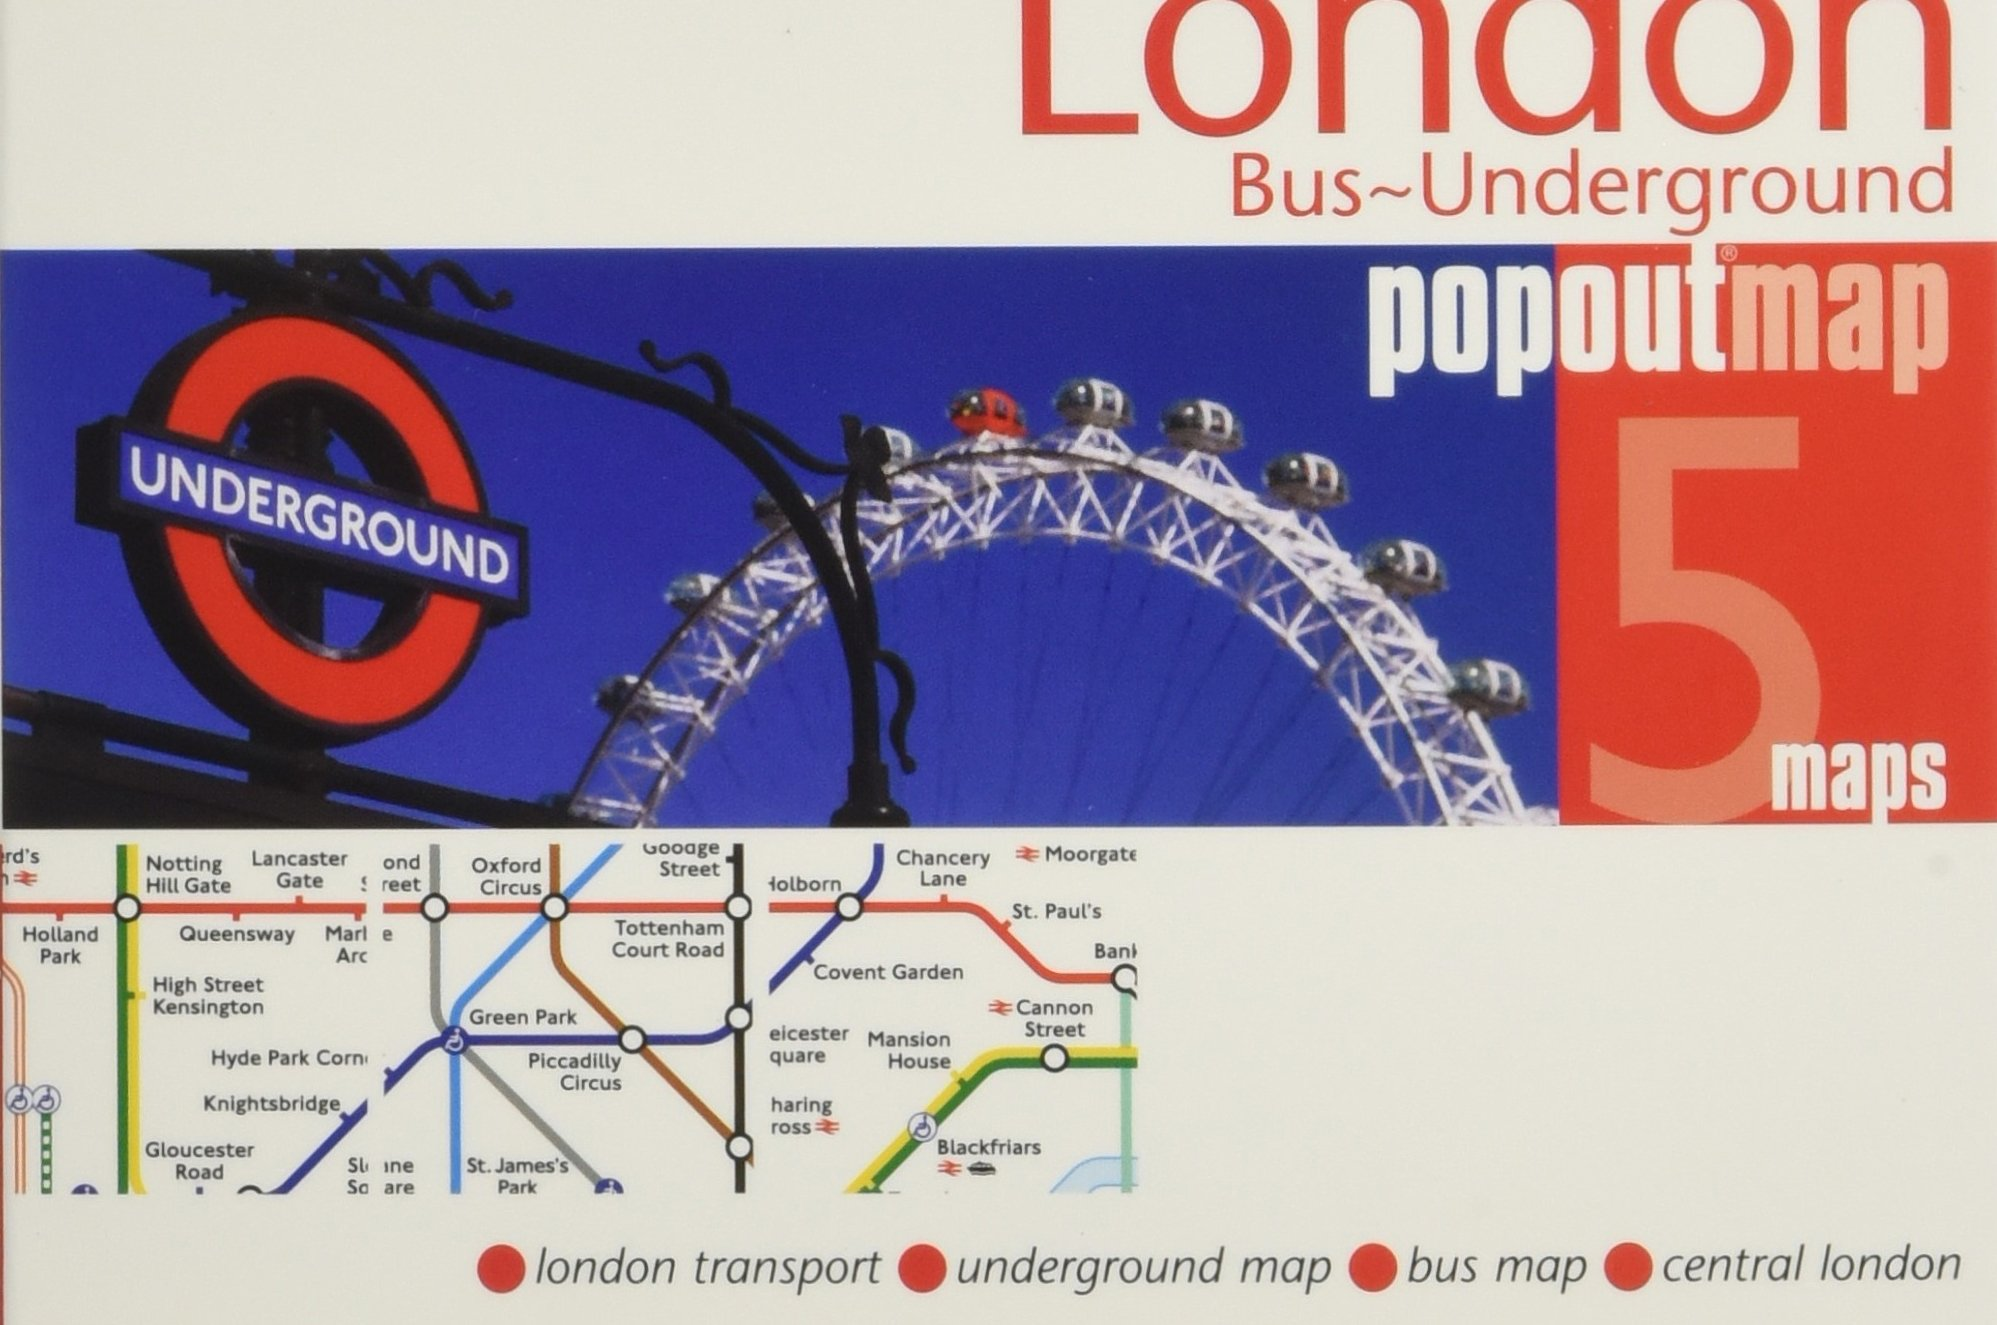 London City Bus Map.London Bus Underground Popout Map Popout Maps Popout Maps